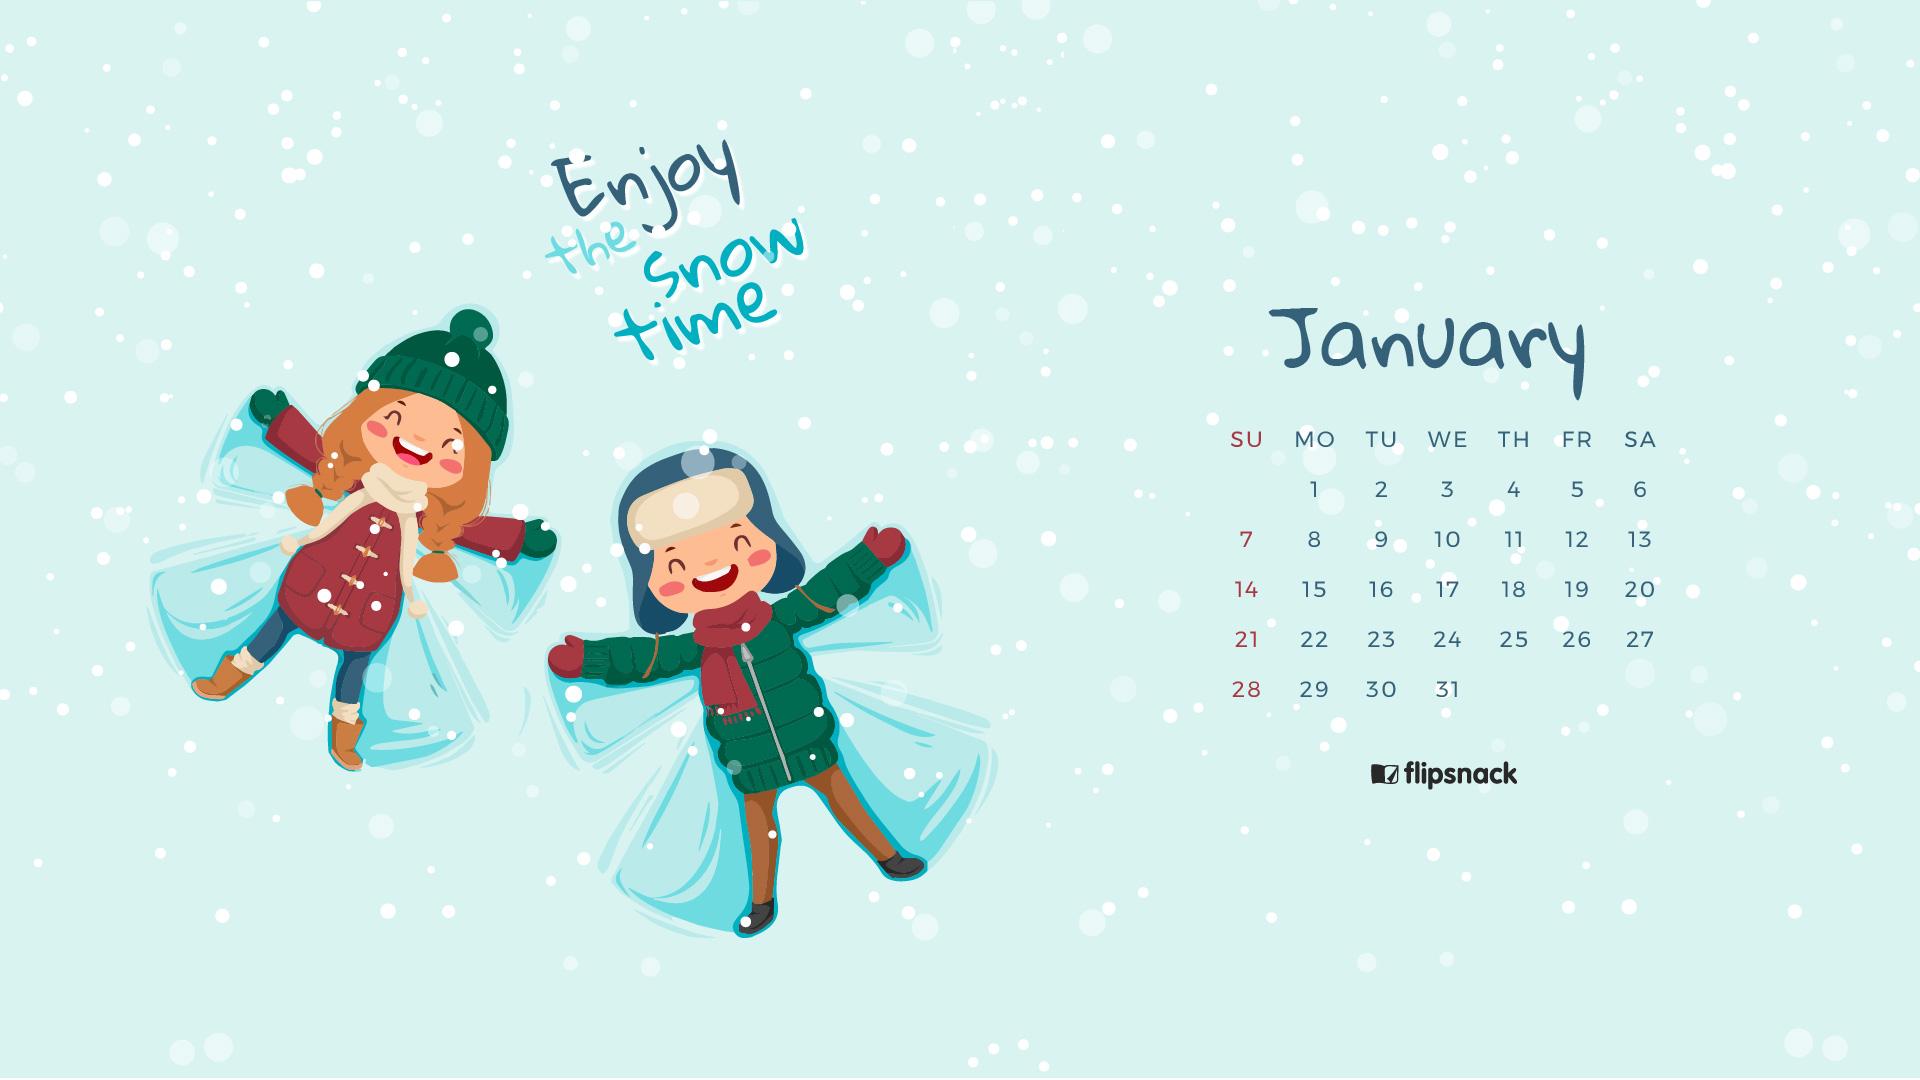 desktop calendar background january 2018   Janwebfactorco 1920x1080